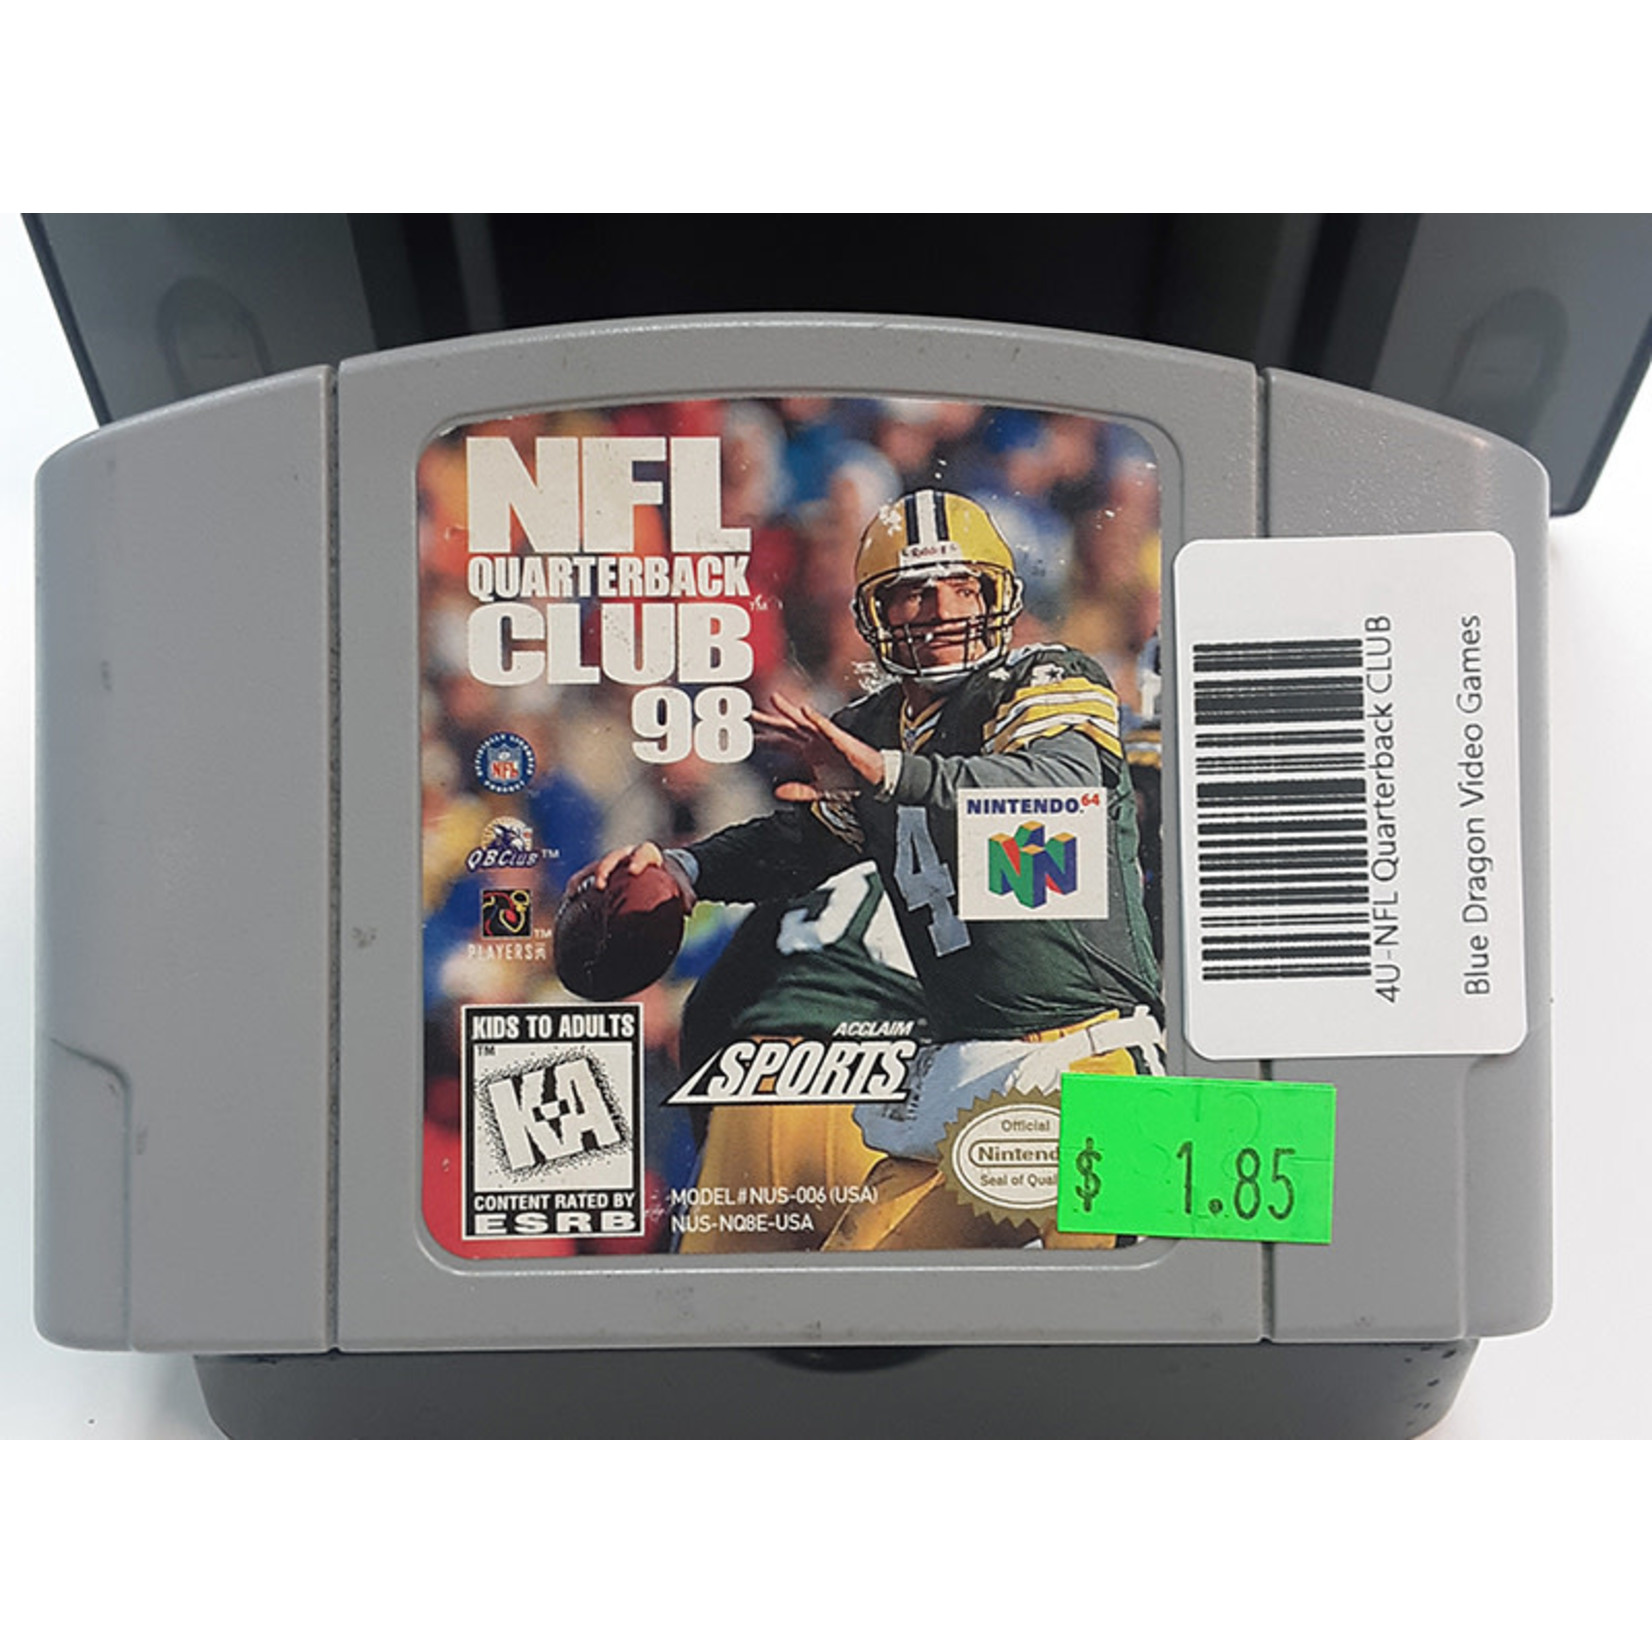 N64U-NFL Quarterback CLUB 98 (cartridge)